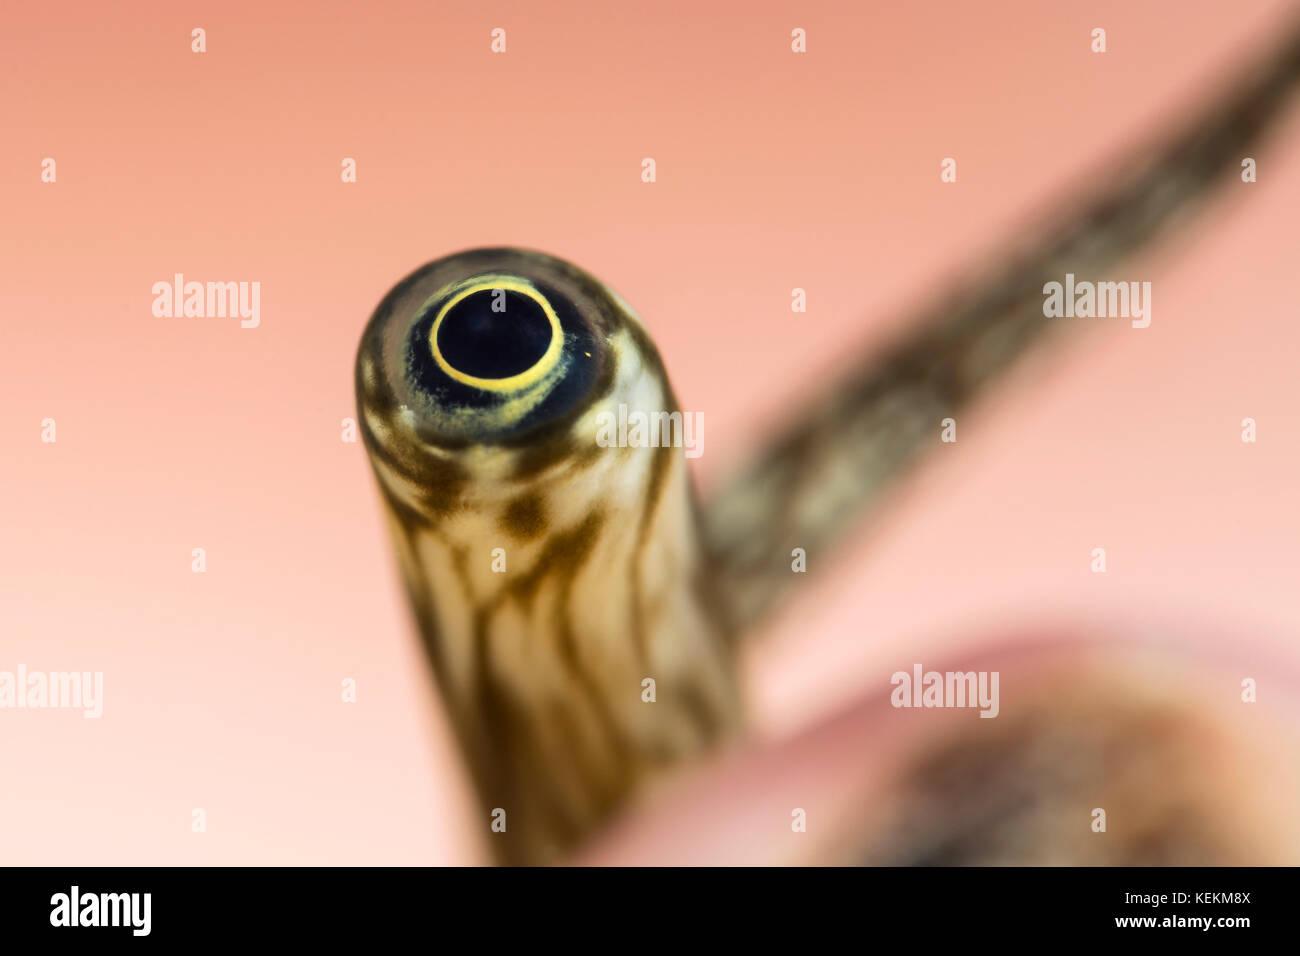 Ojo de araña gigante, concha lambis truncata, Marsa Alam, Mar Rojo, Egipto Imagen De Stock